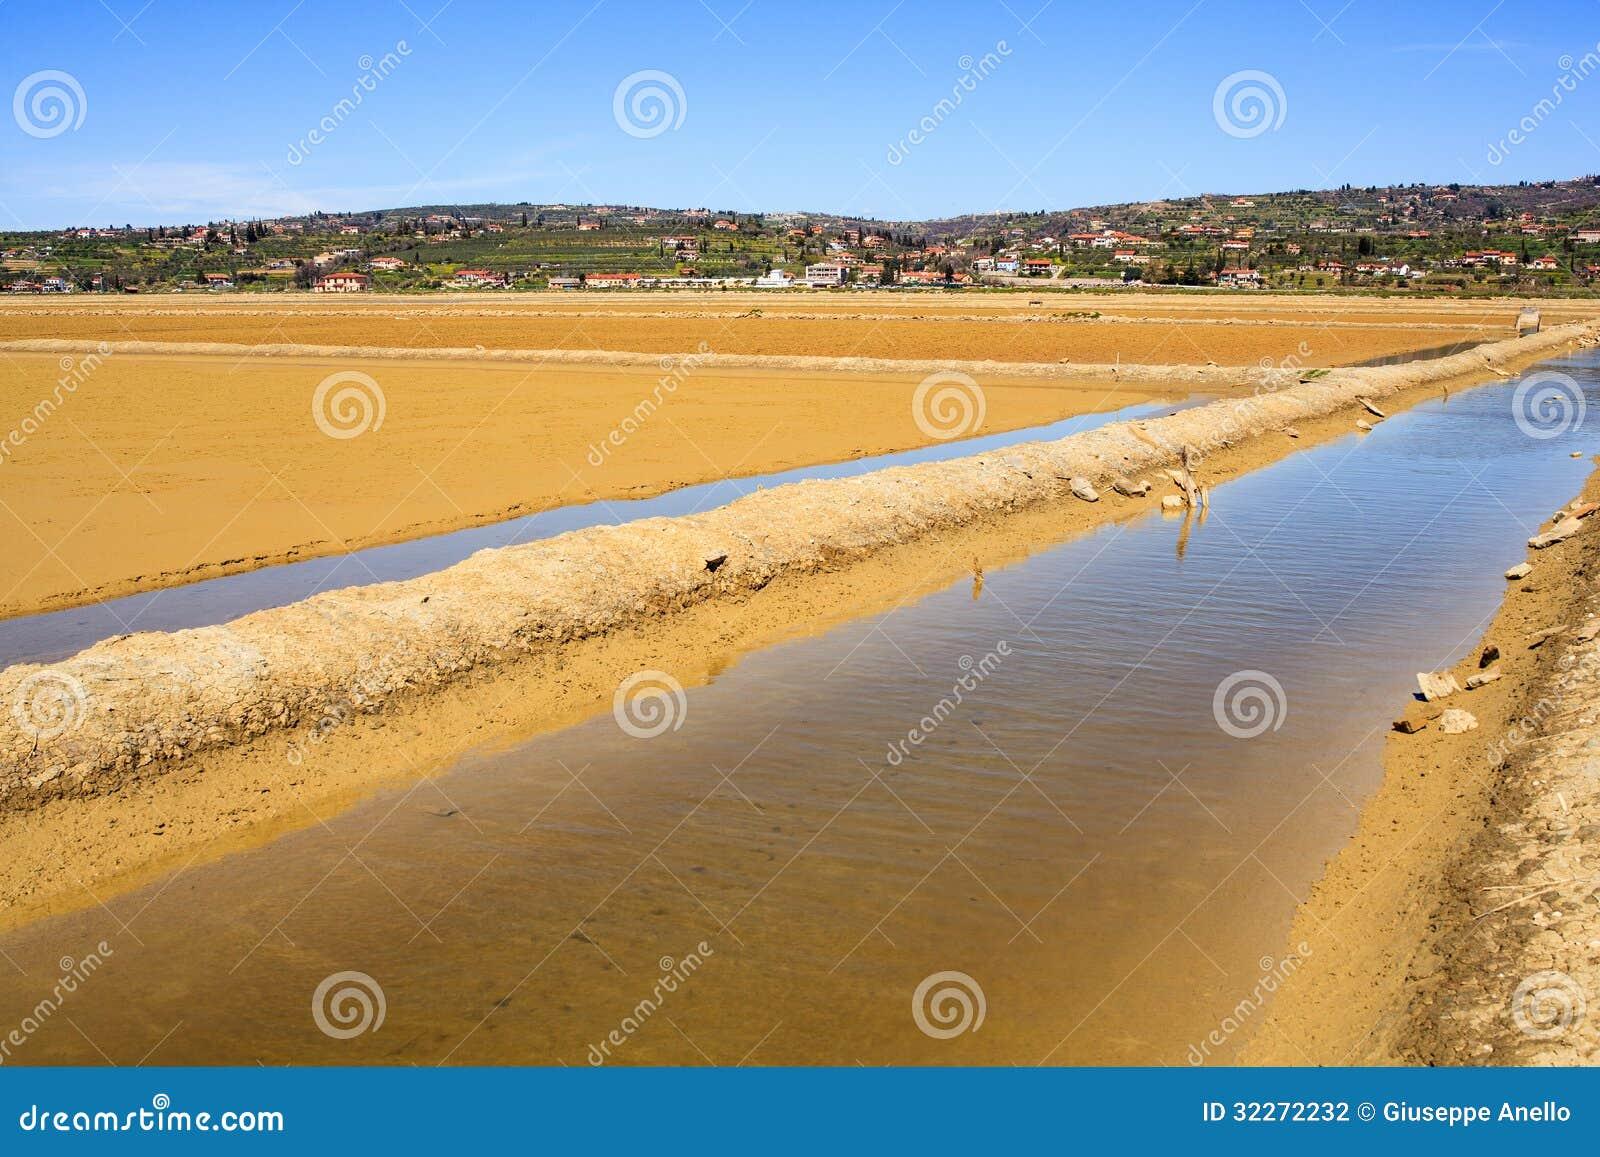 View of salt evaporation ponds in secovlje stock for Design of evaporation pond